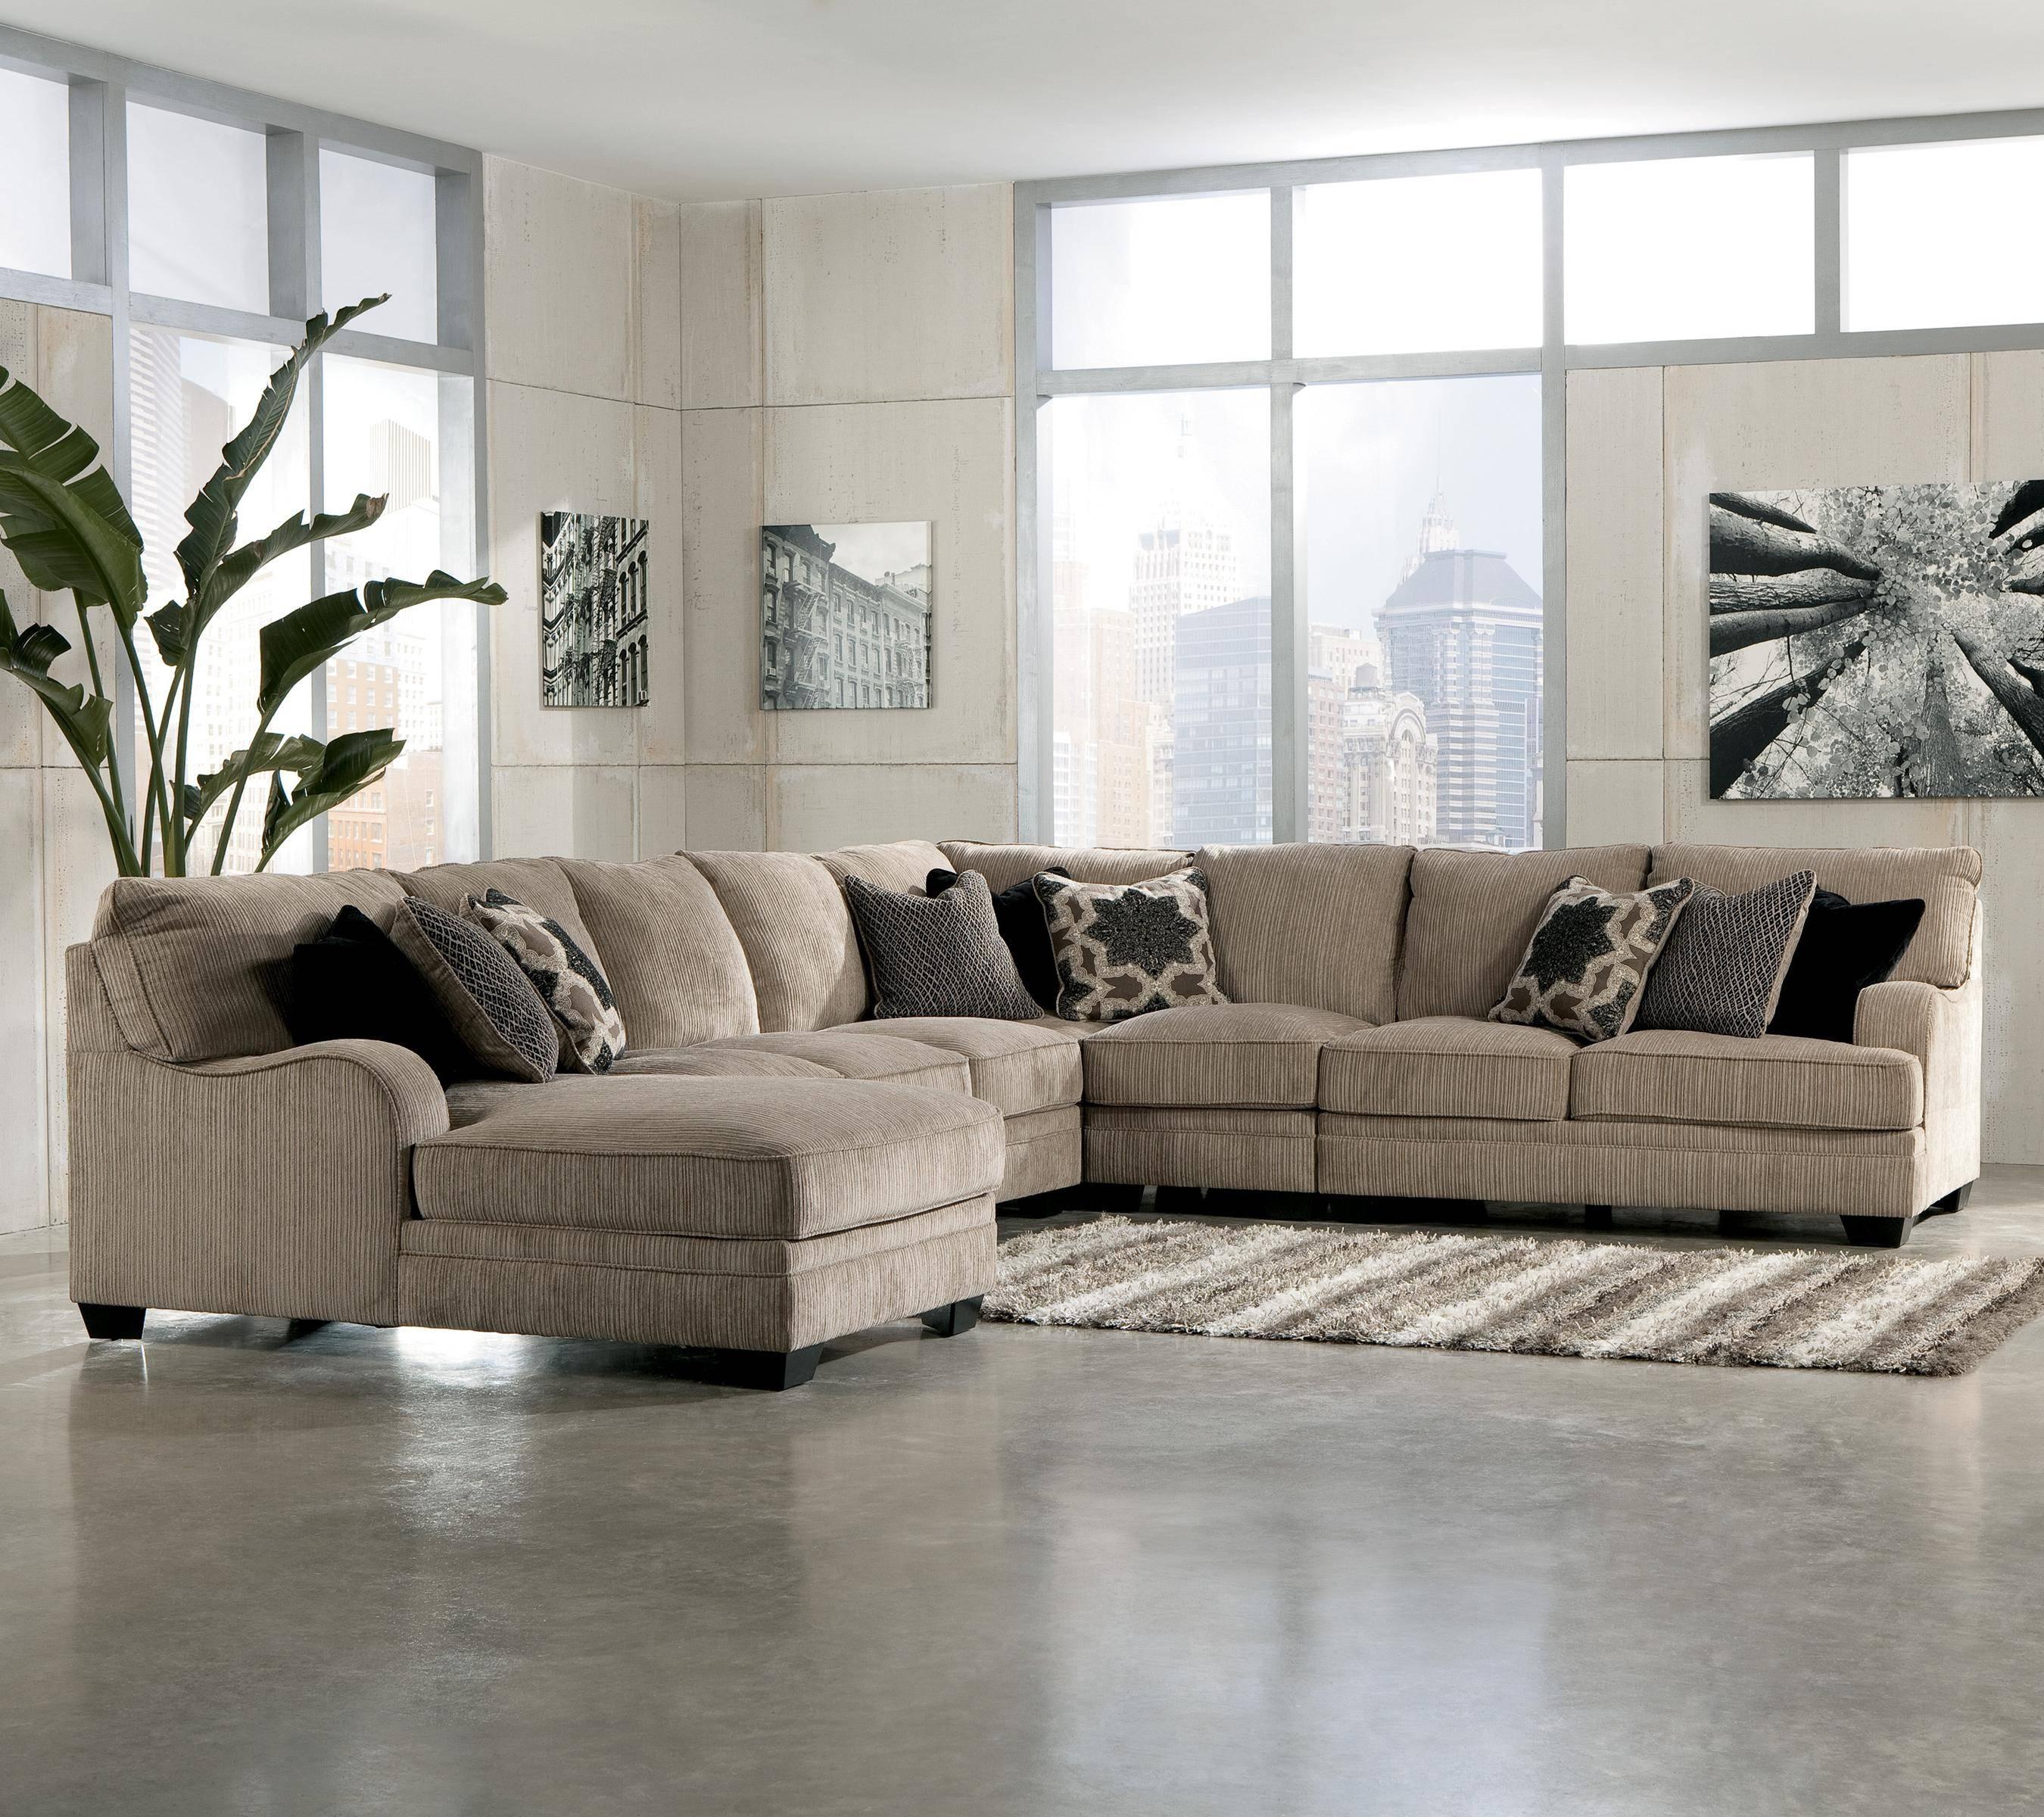 Furniture Ashley Charlotte Nc Sleeper Sofa Huntsville Al within Richmond Sectional Sofas (Image 4 of 15)